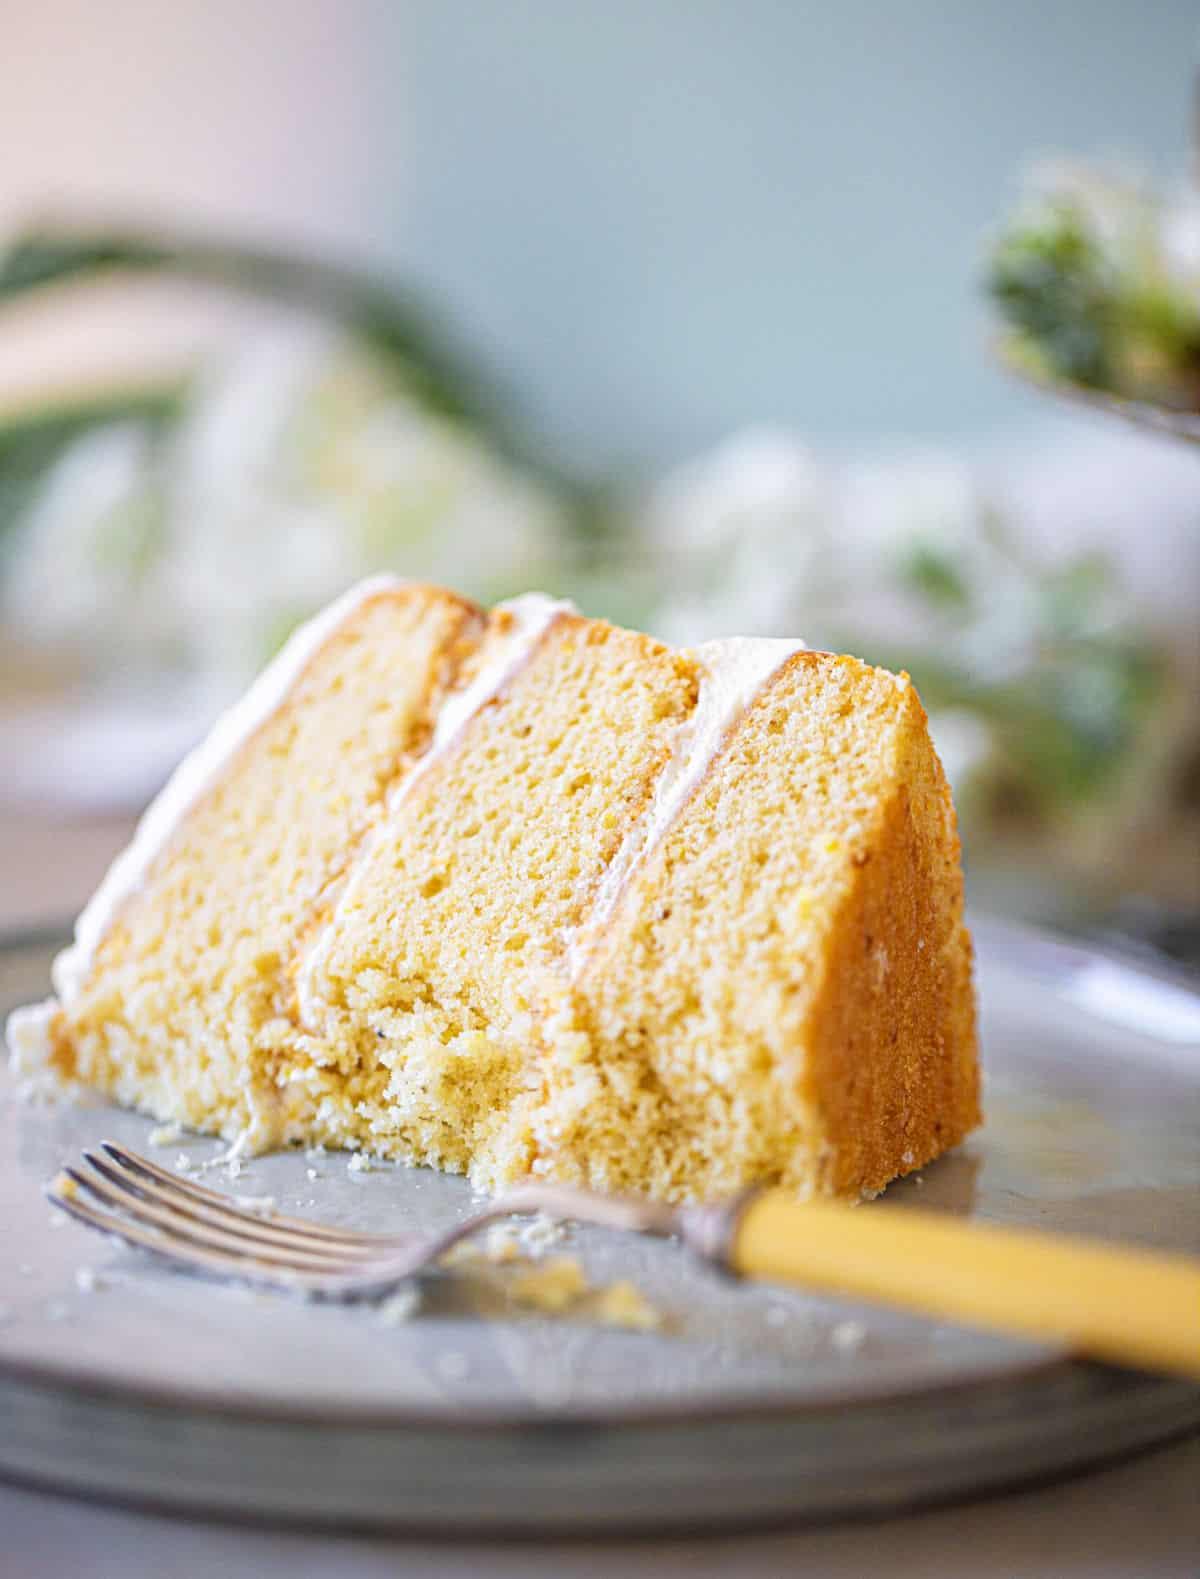 Eaten single slice of layer lemon cream cake with fork on grey plate